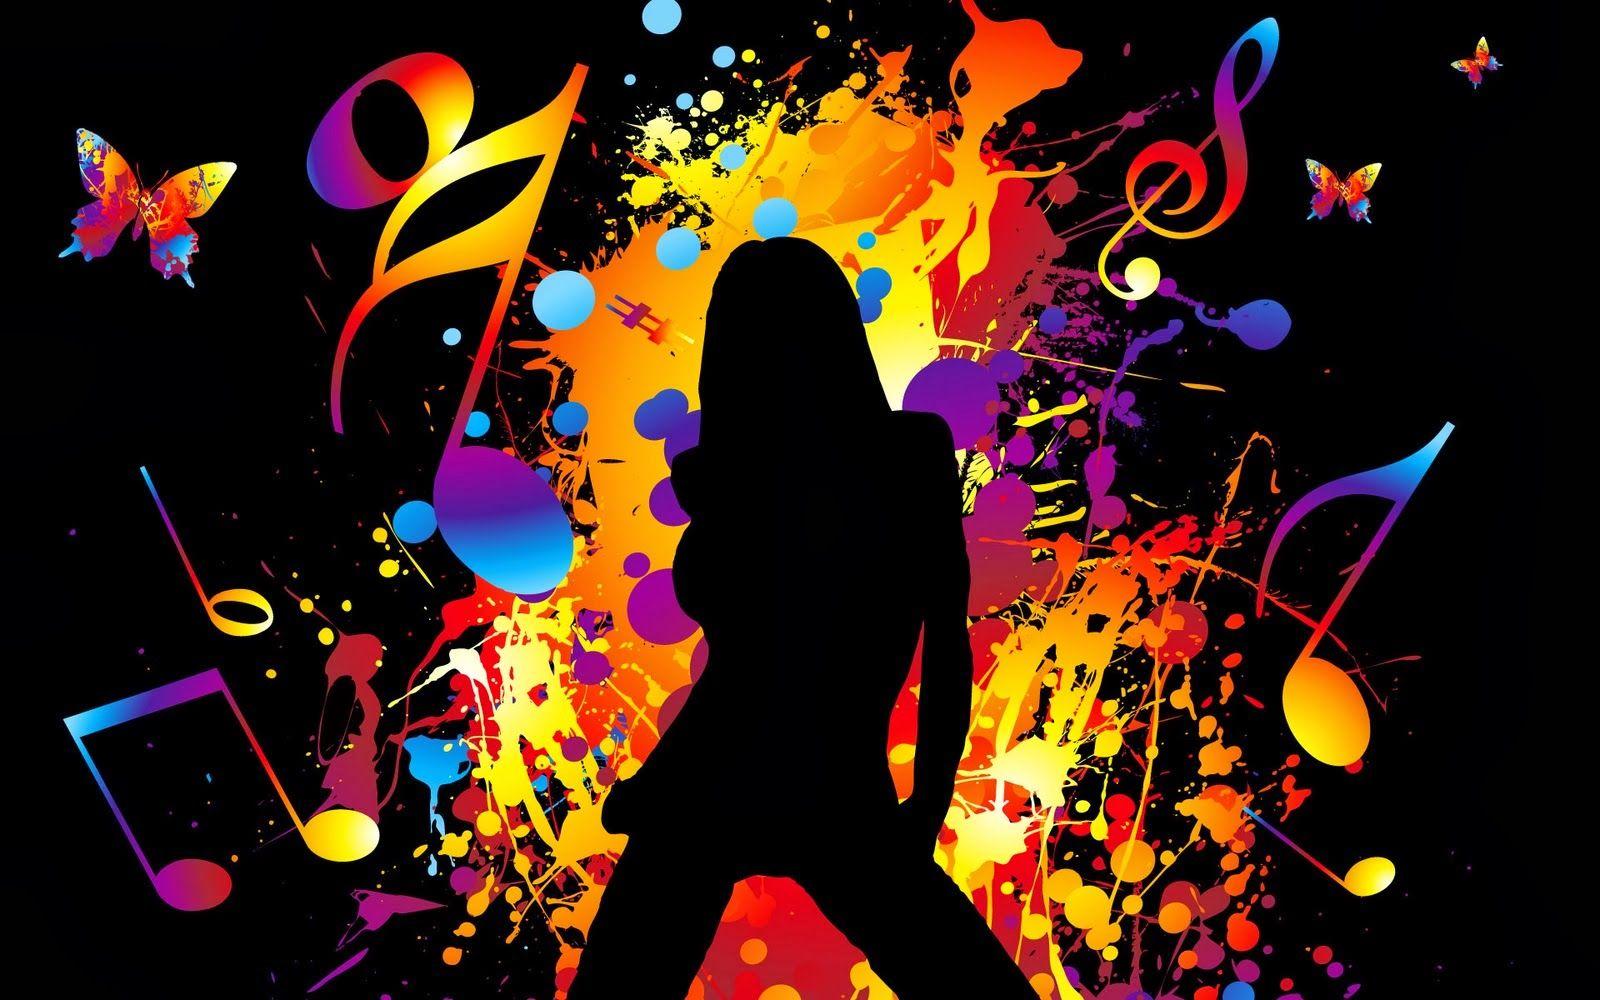 Beautiful Wallpaper Music Desktop - 21b211e4692cfa6adb2aae712ba65627  Graphic_982031.jpg